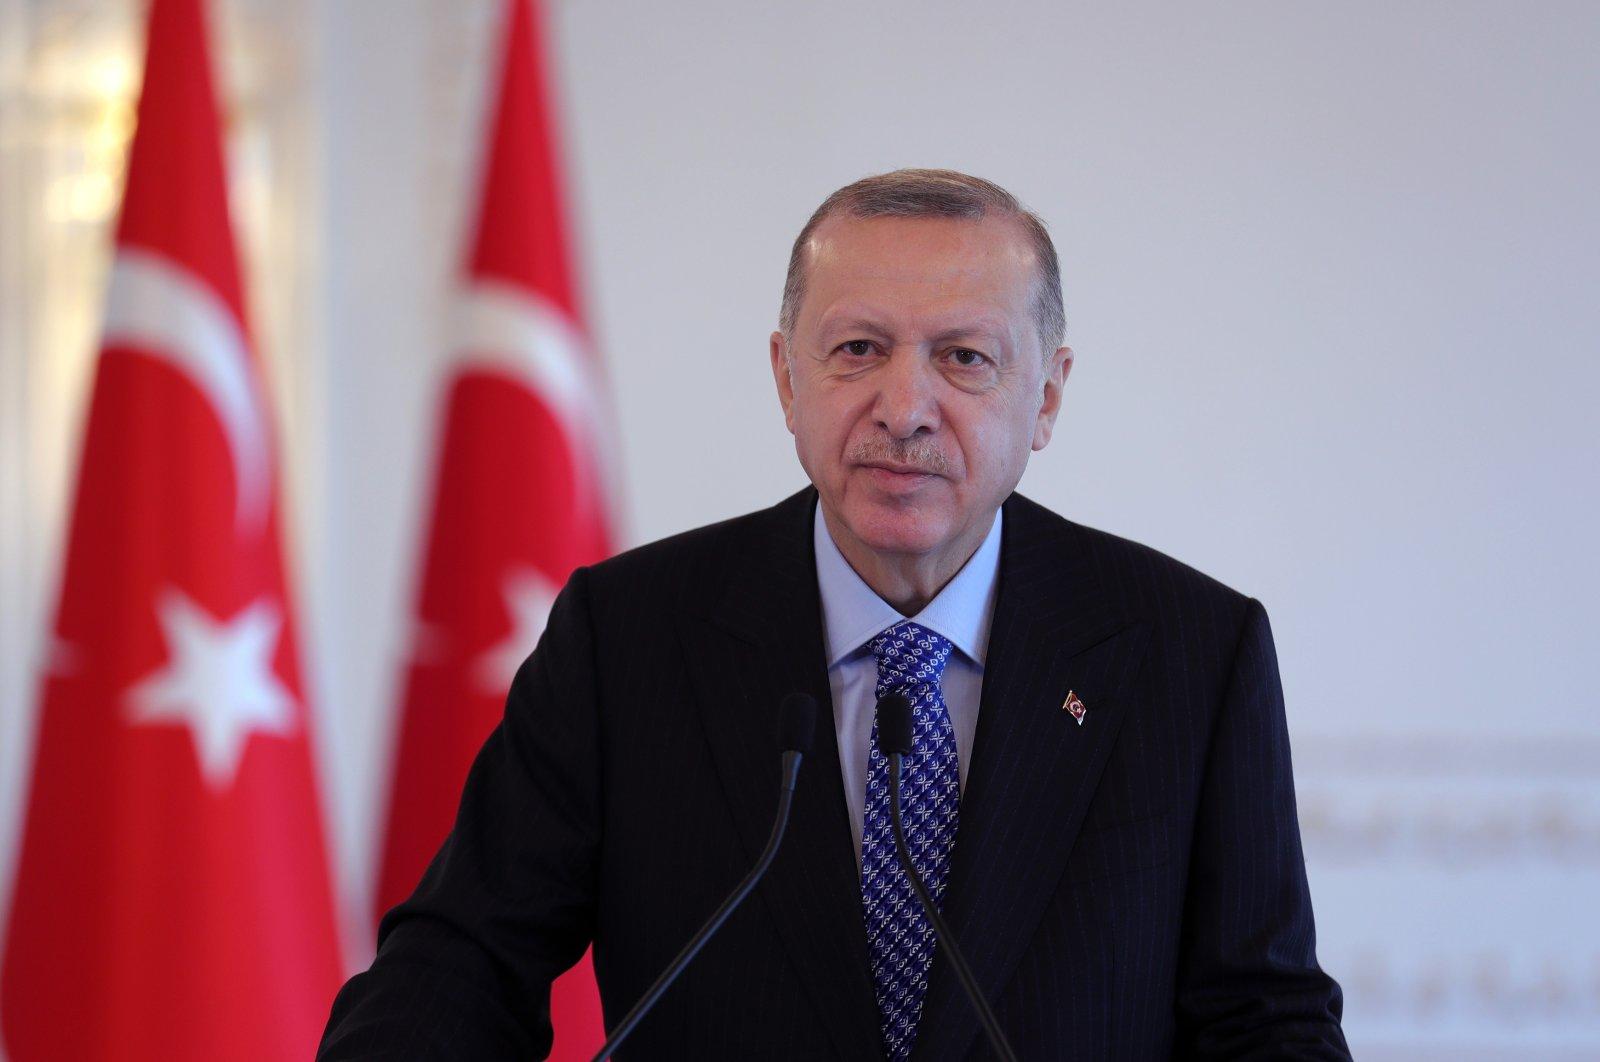 President Recep Tayyip Erdoğan adresses a defense event via video link, Istanbul, Turkey, Dec. 5, 2020. (AA Photo)